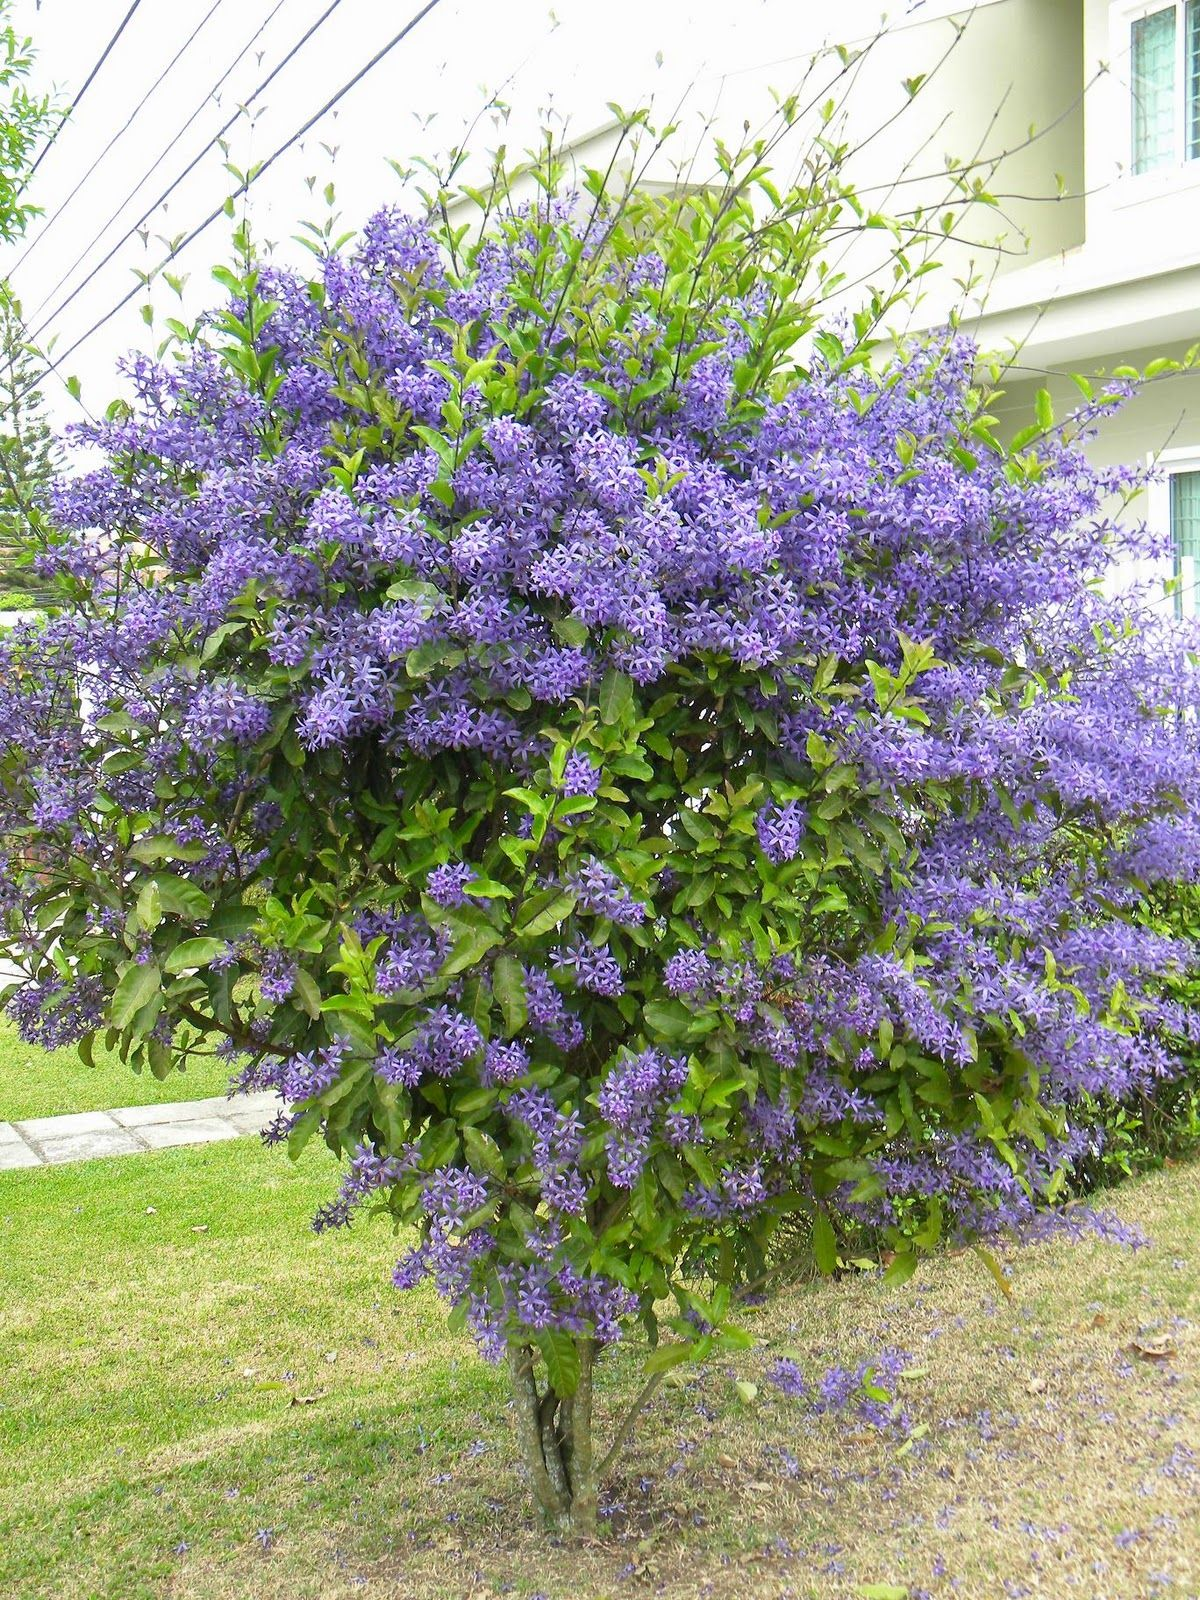 Viuvinha Jpg 1200 1600 Flowering Trees Trees To Plant